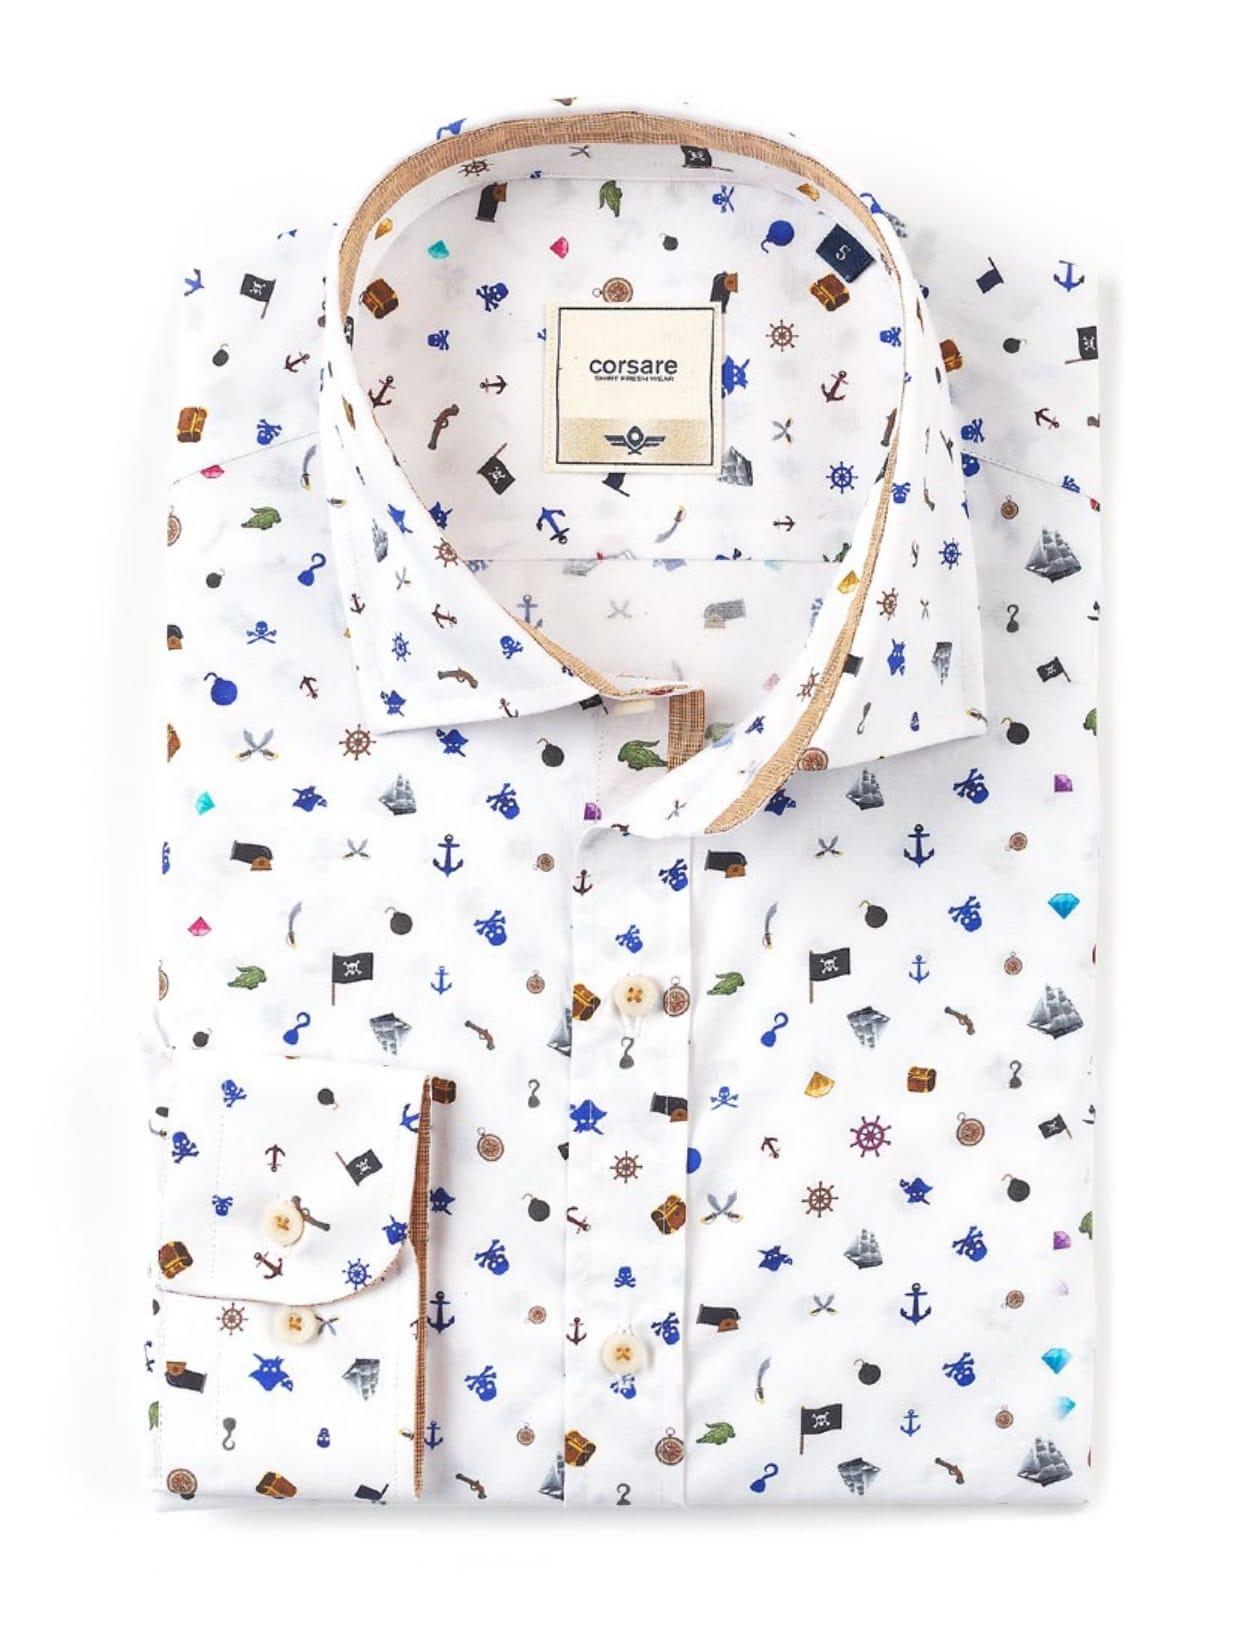 camisa de verano para hombre sastreria lorenzo, moda masculina y complementos en lleida